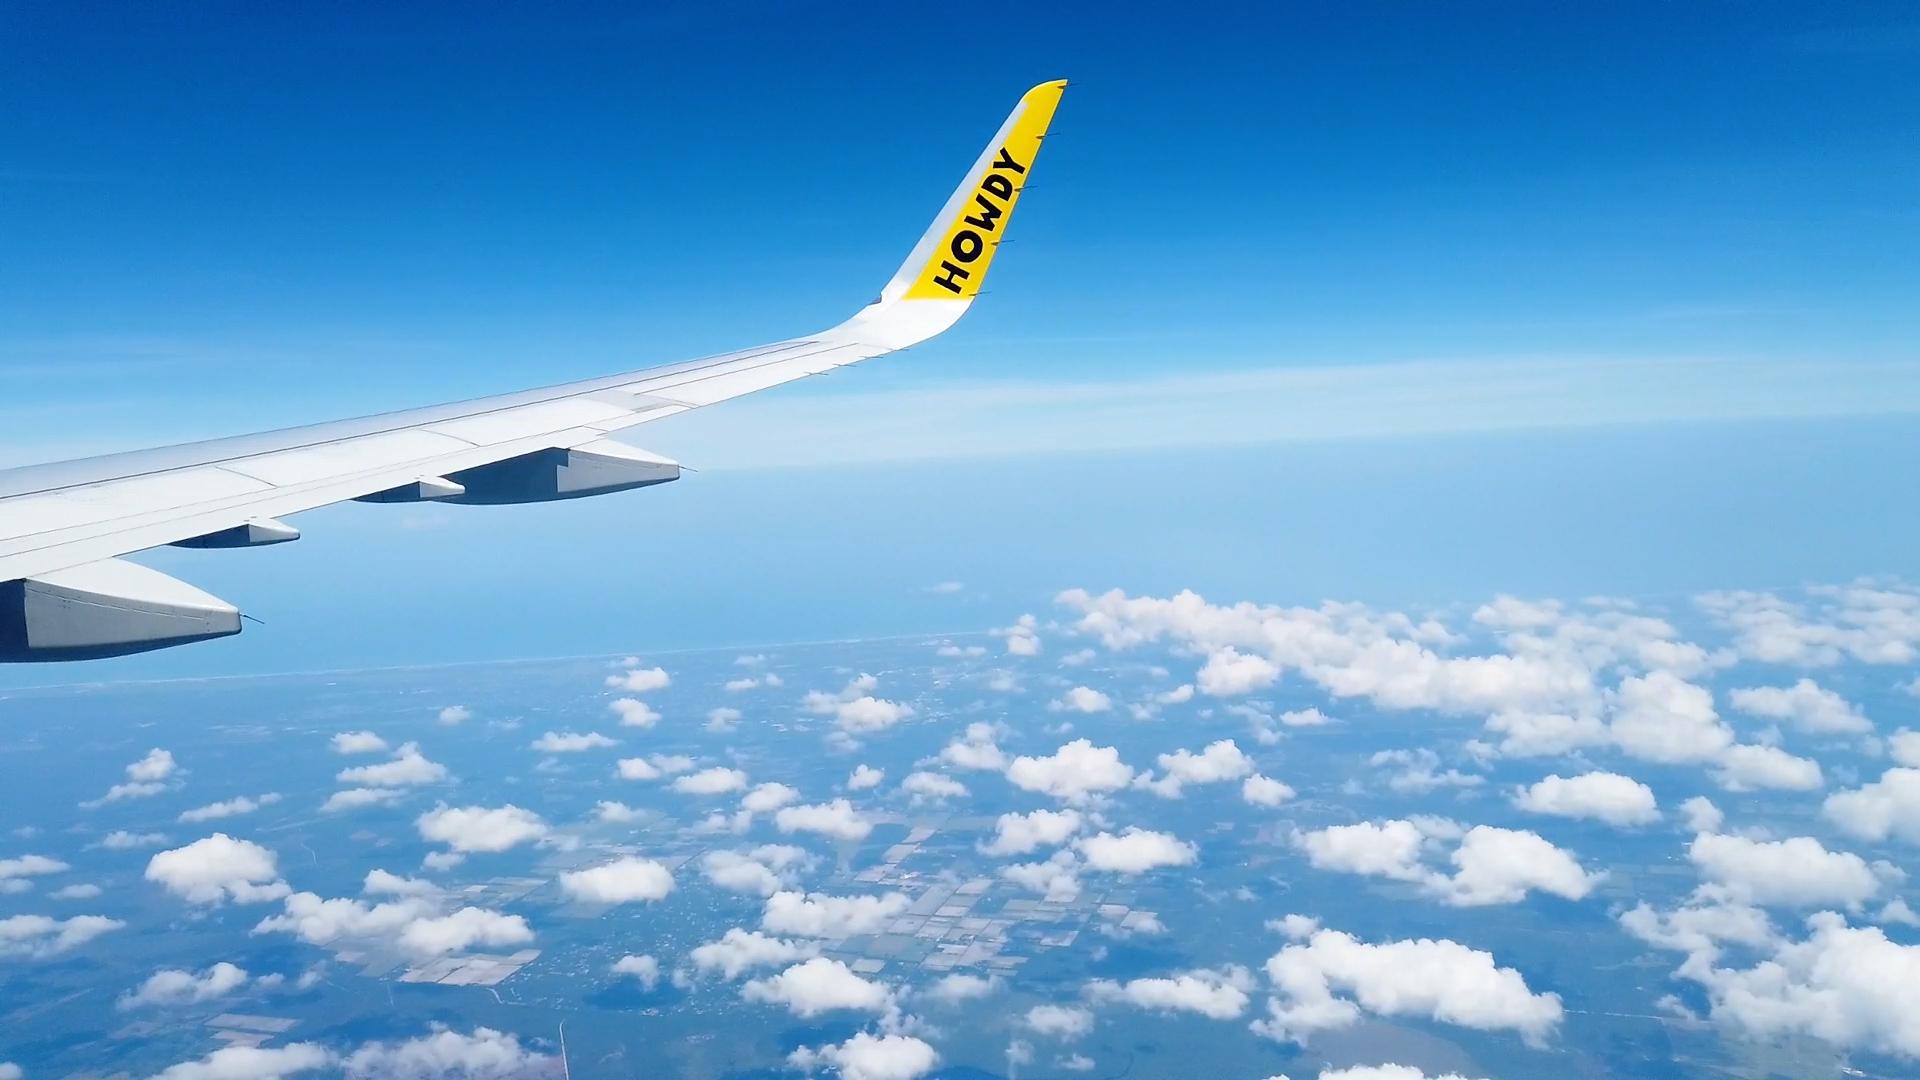 plane ride photo